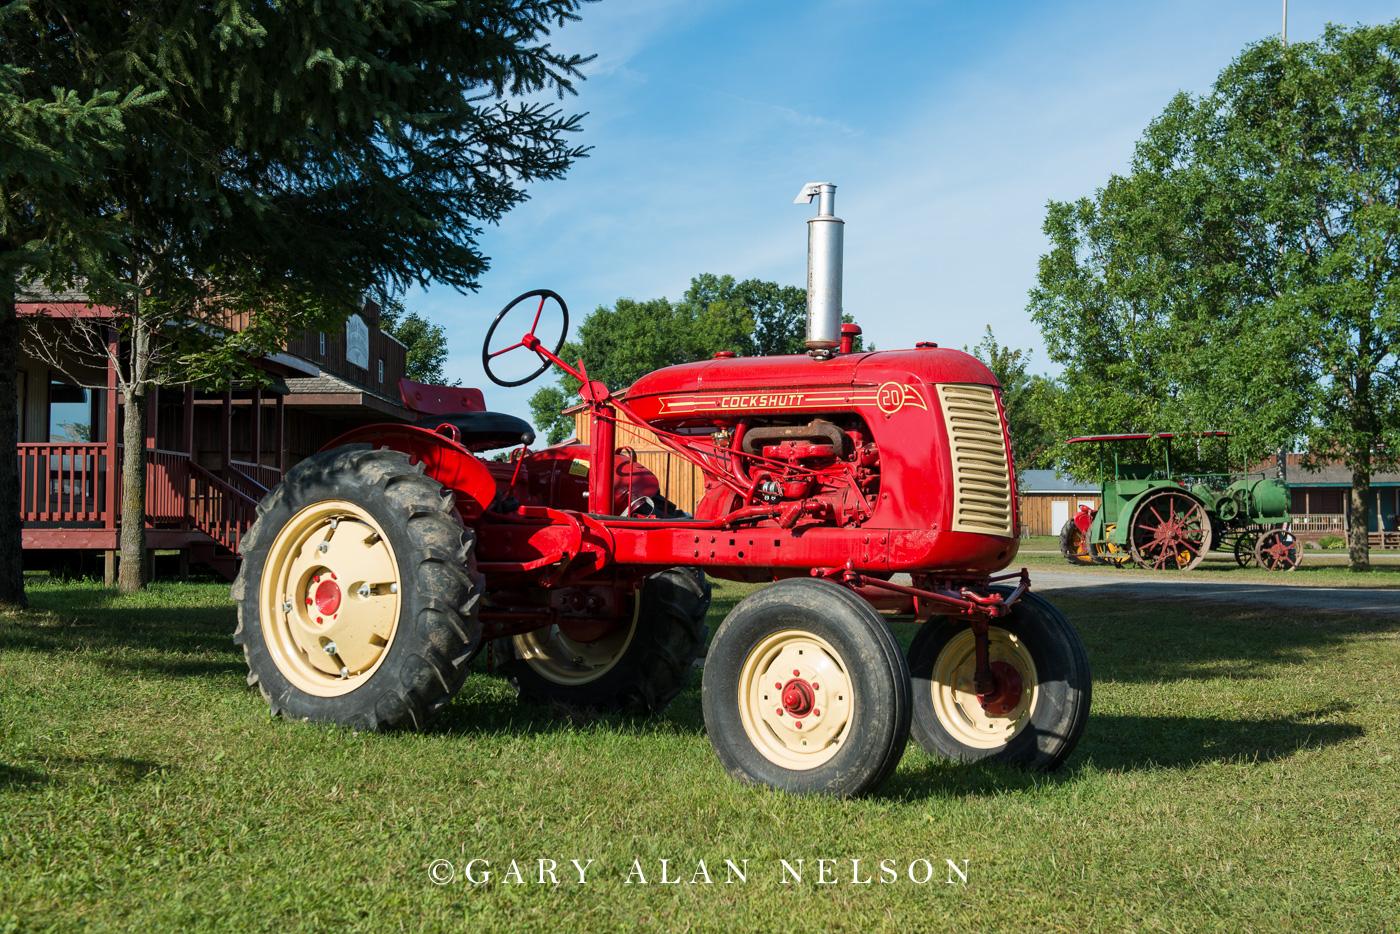 Cockshutt, antique tractor, photo